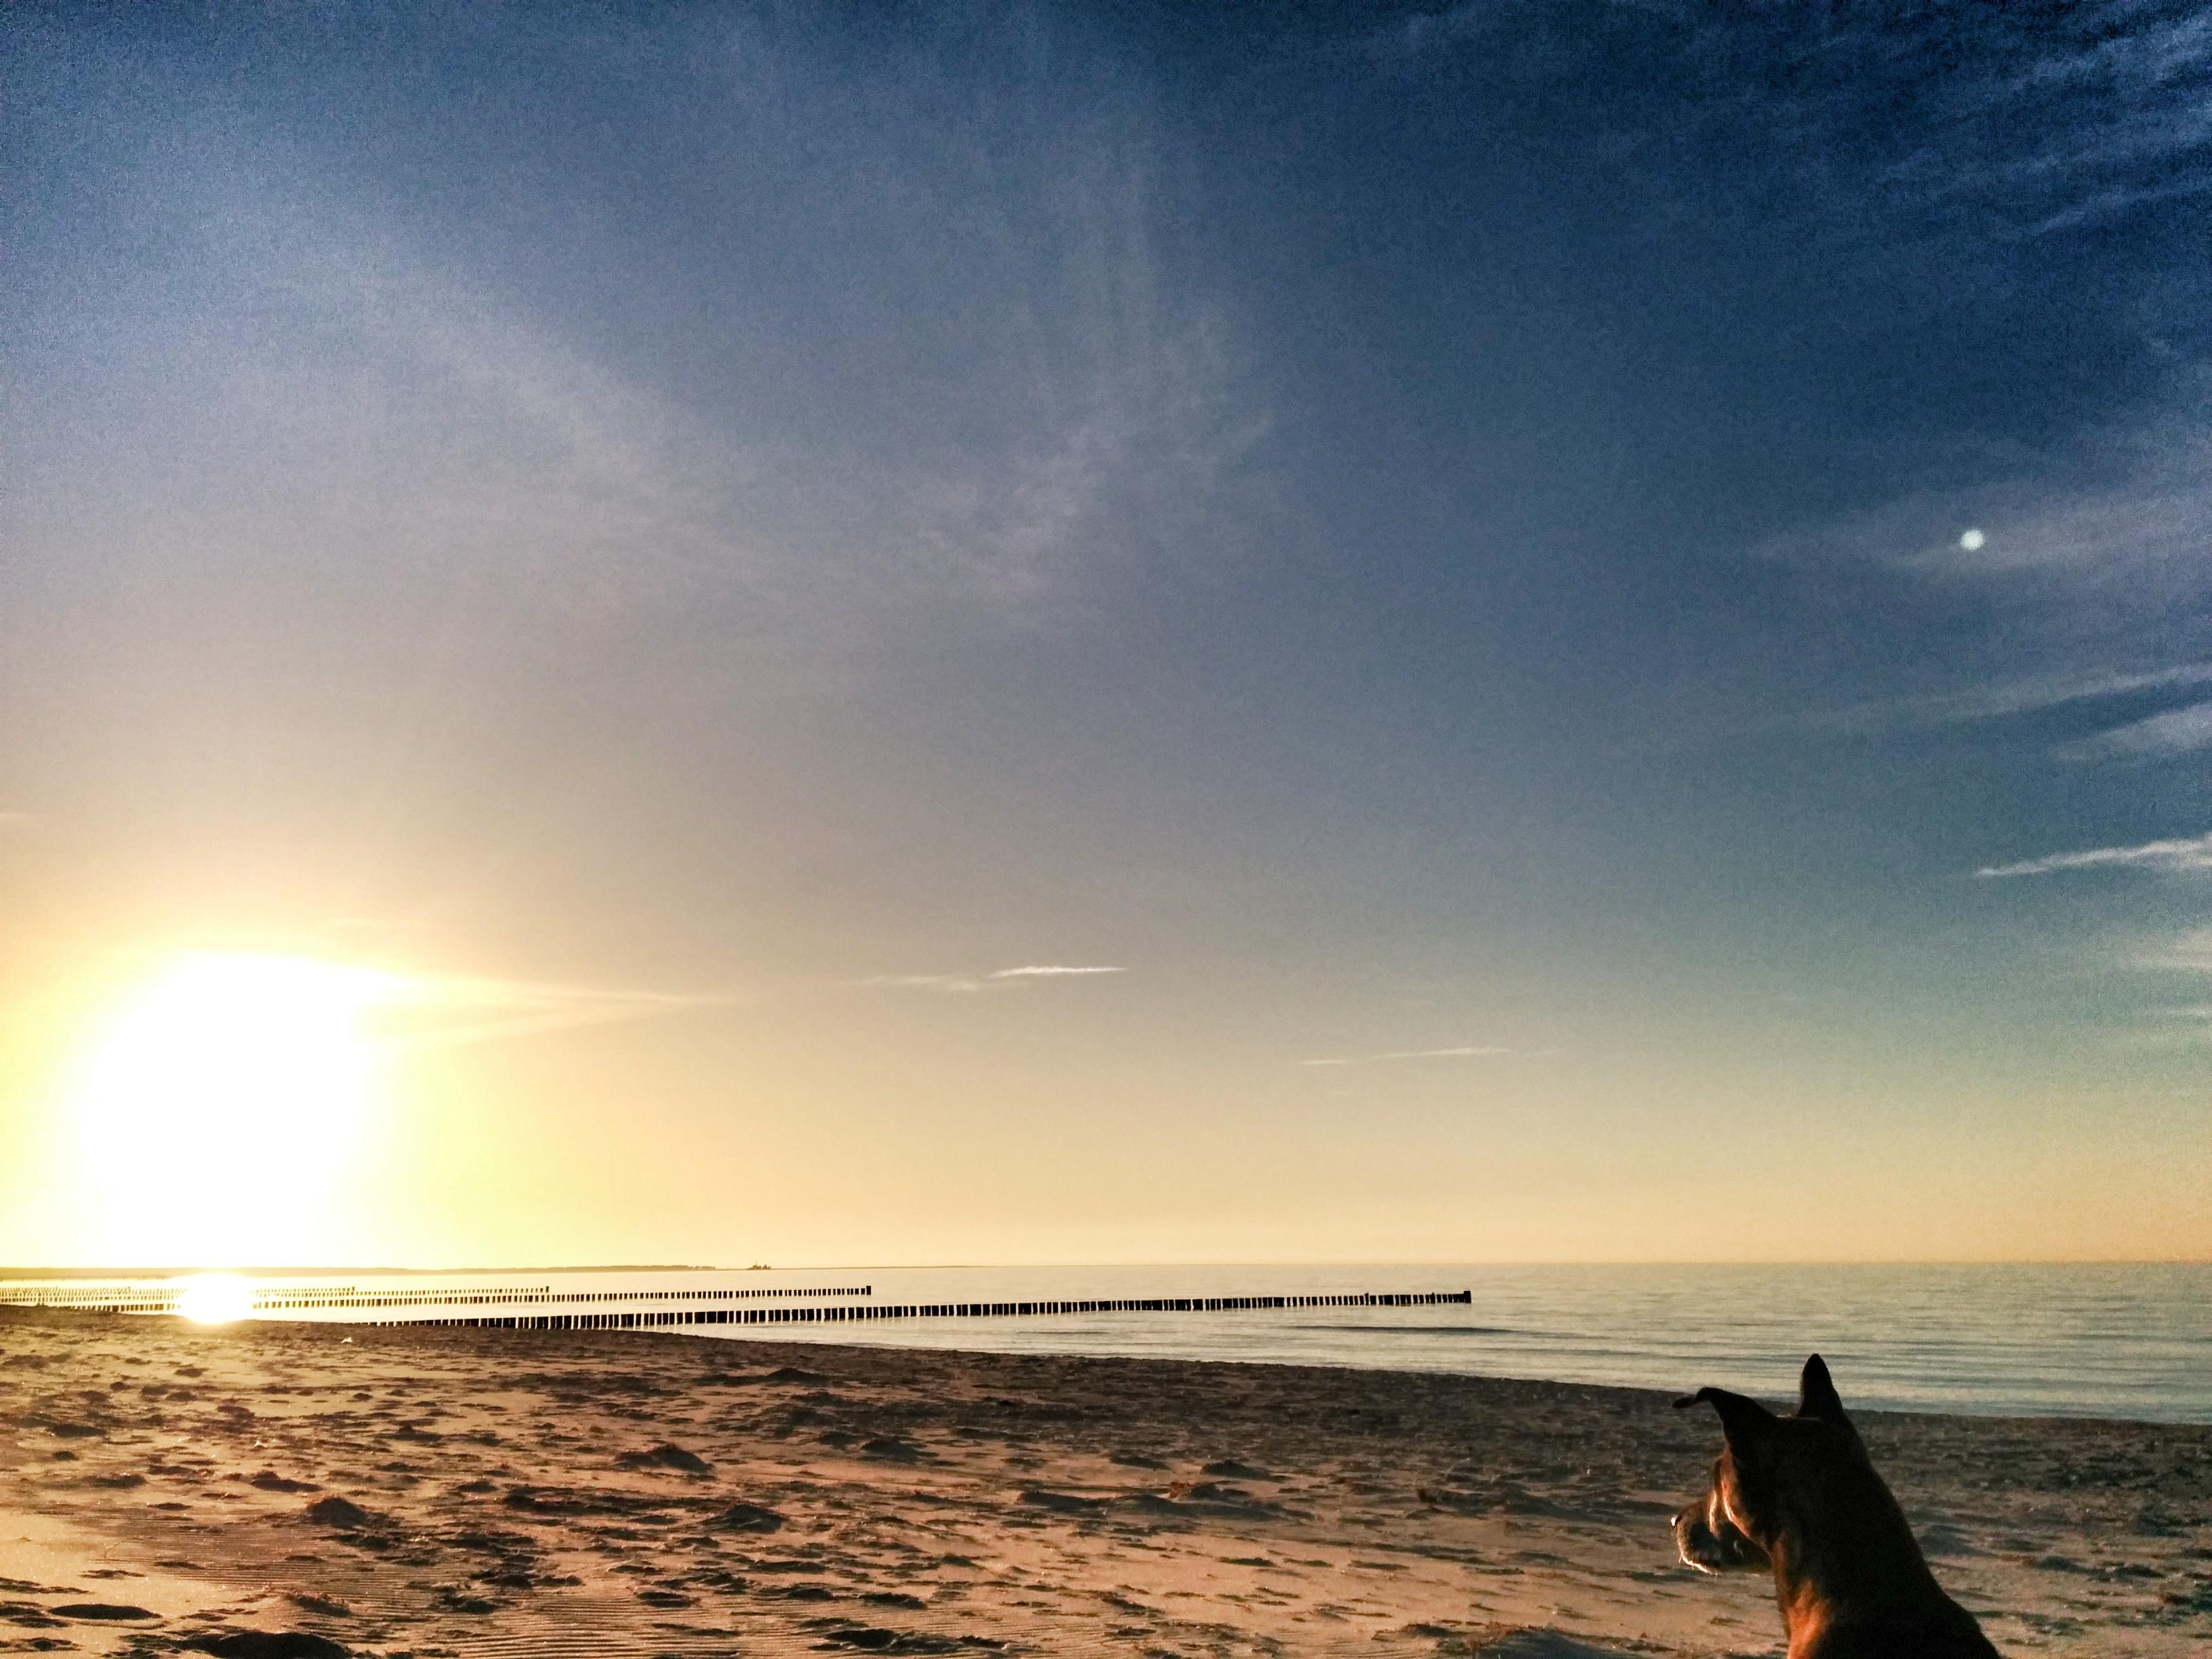 Abendstimmung am Nordstrand der Ostsee